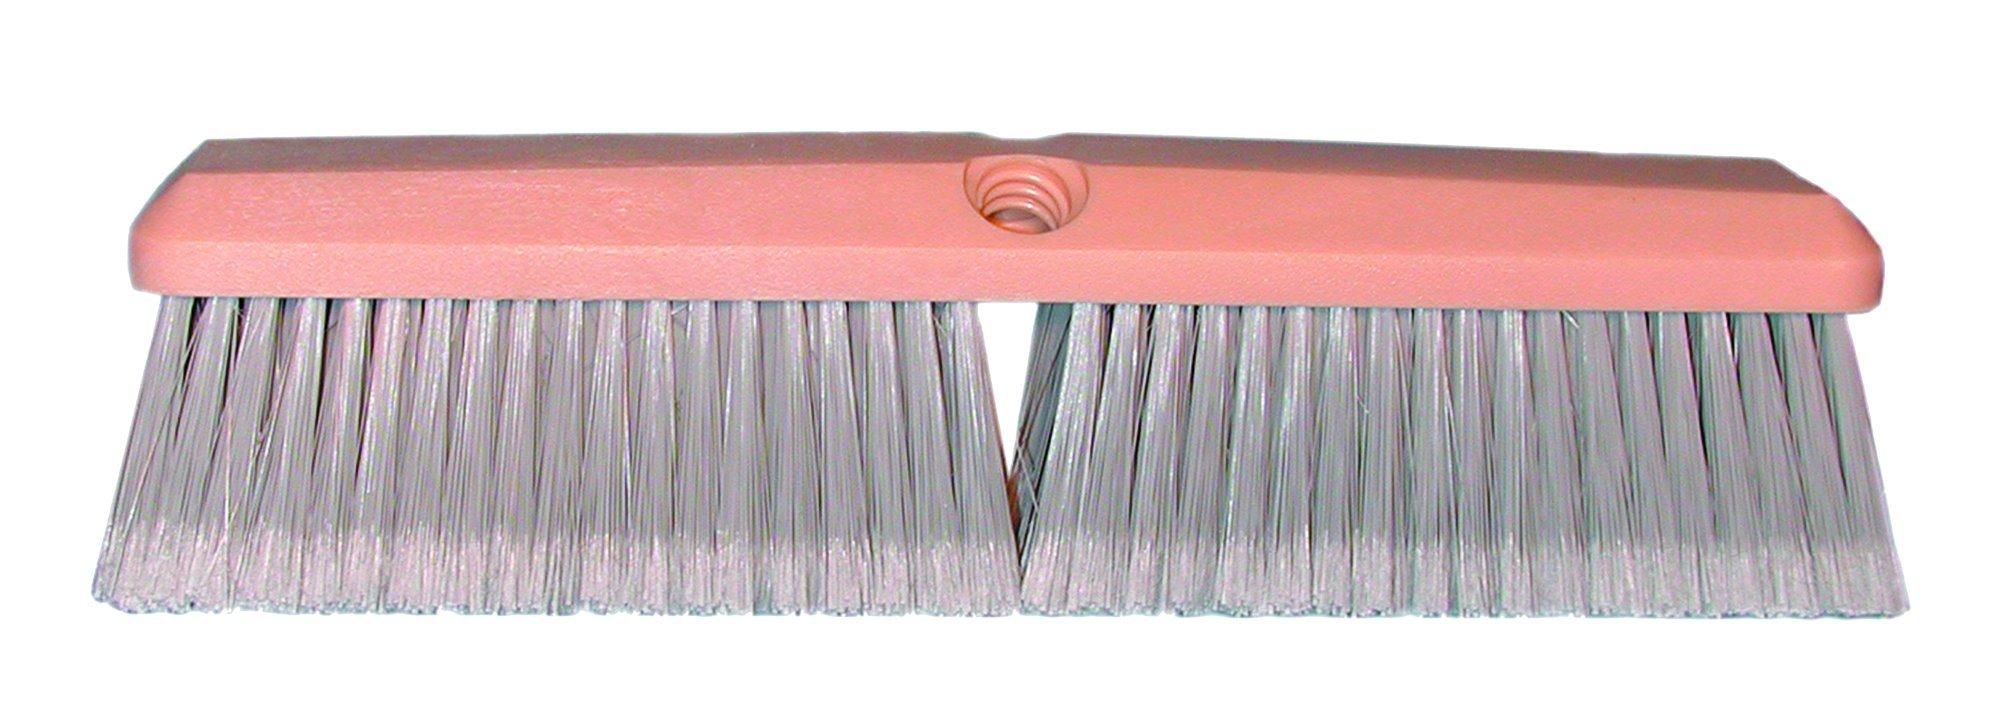 Magnolia Brush 3314 Foam Plastic Block Vehicle Wash Brush, Flagged Polystyrene Bristles, 2-1/2'' Trim, 14'' Length, Gray (Case of 12)